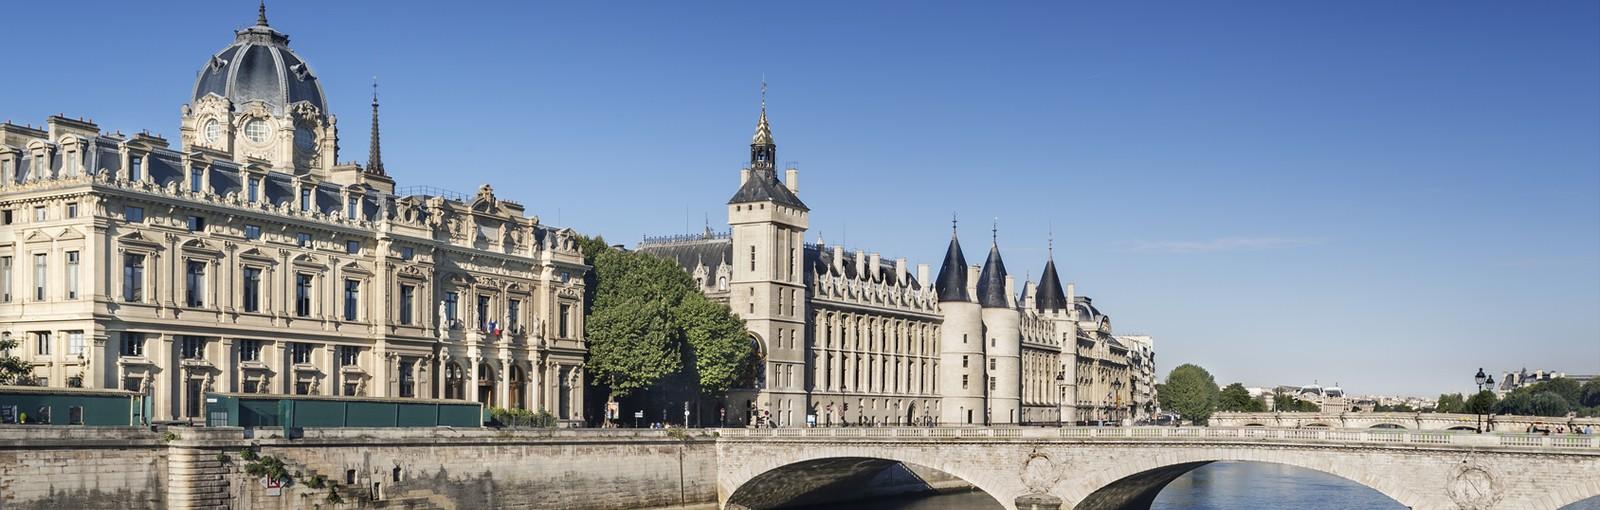 Tours 巴黎和卢浮宫一日游 - 巴黎市区游 - 巴黎游